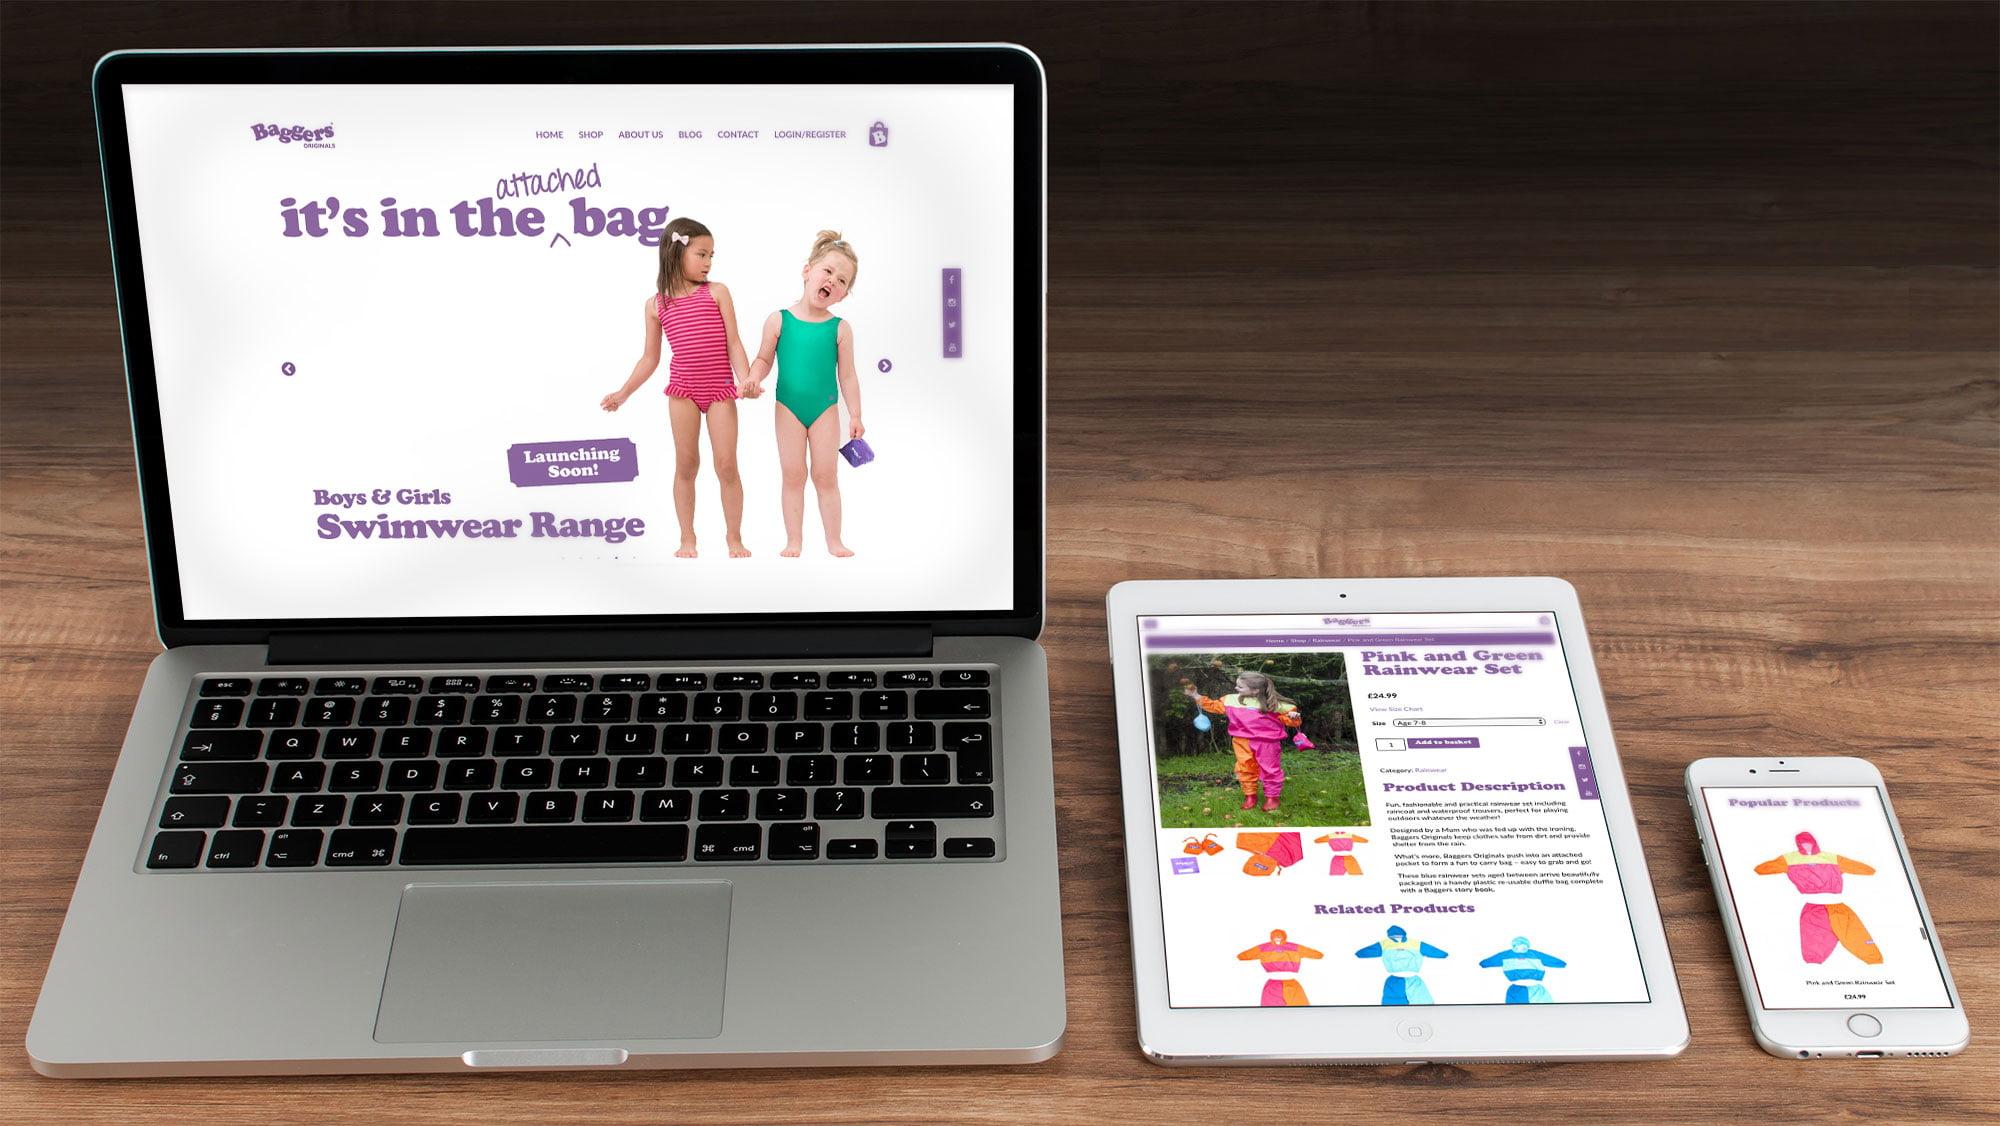 Baggers Originals website displayed on laptop, tablet and mobile